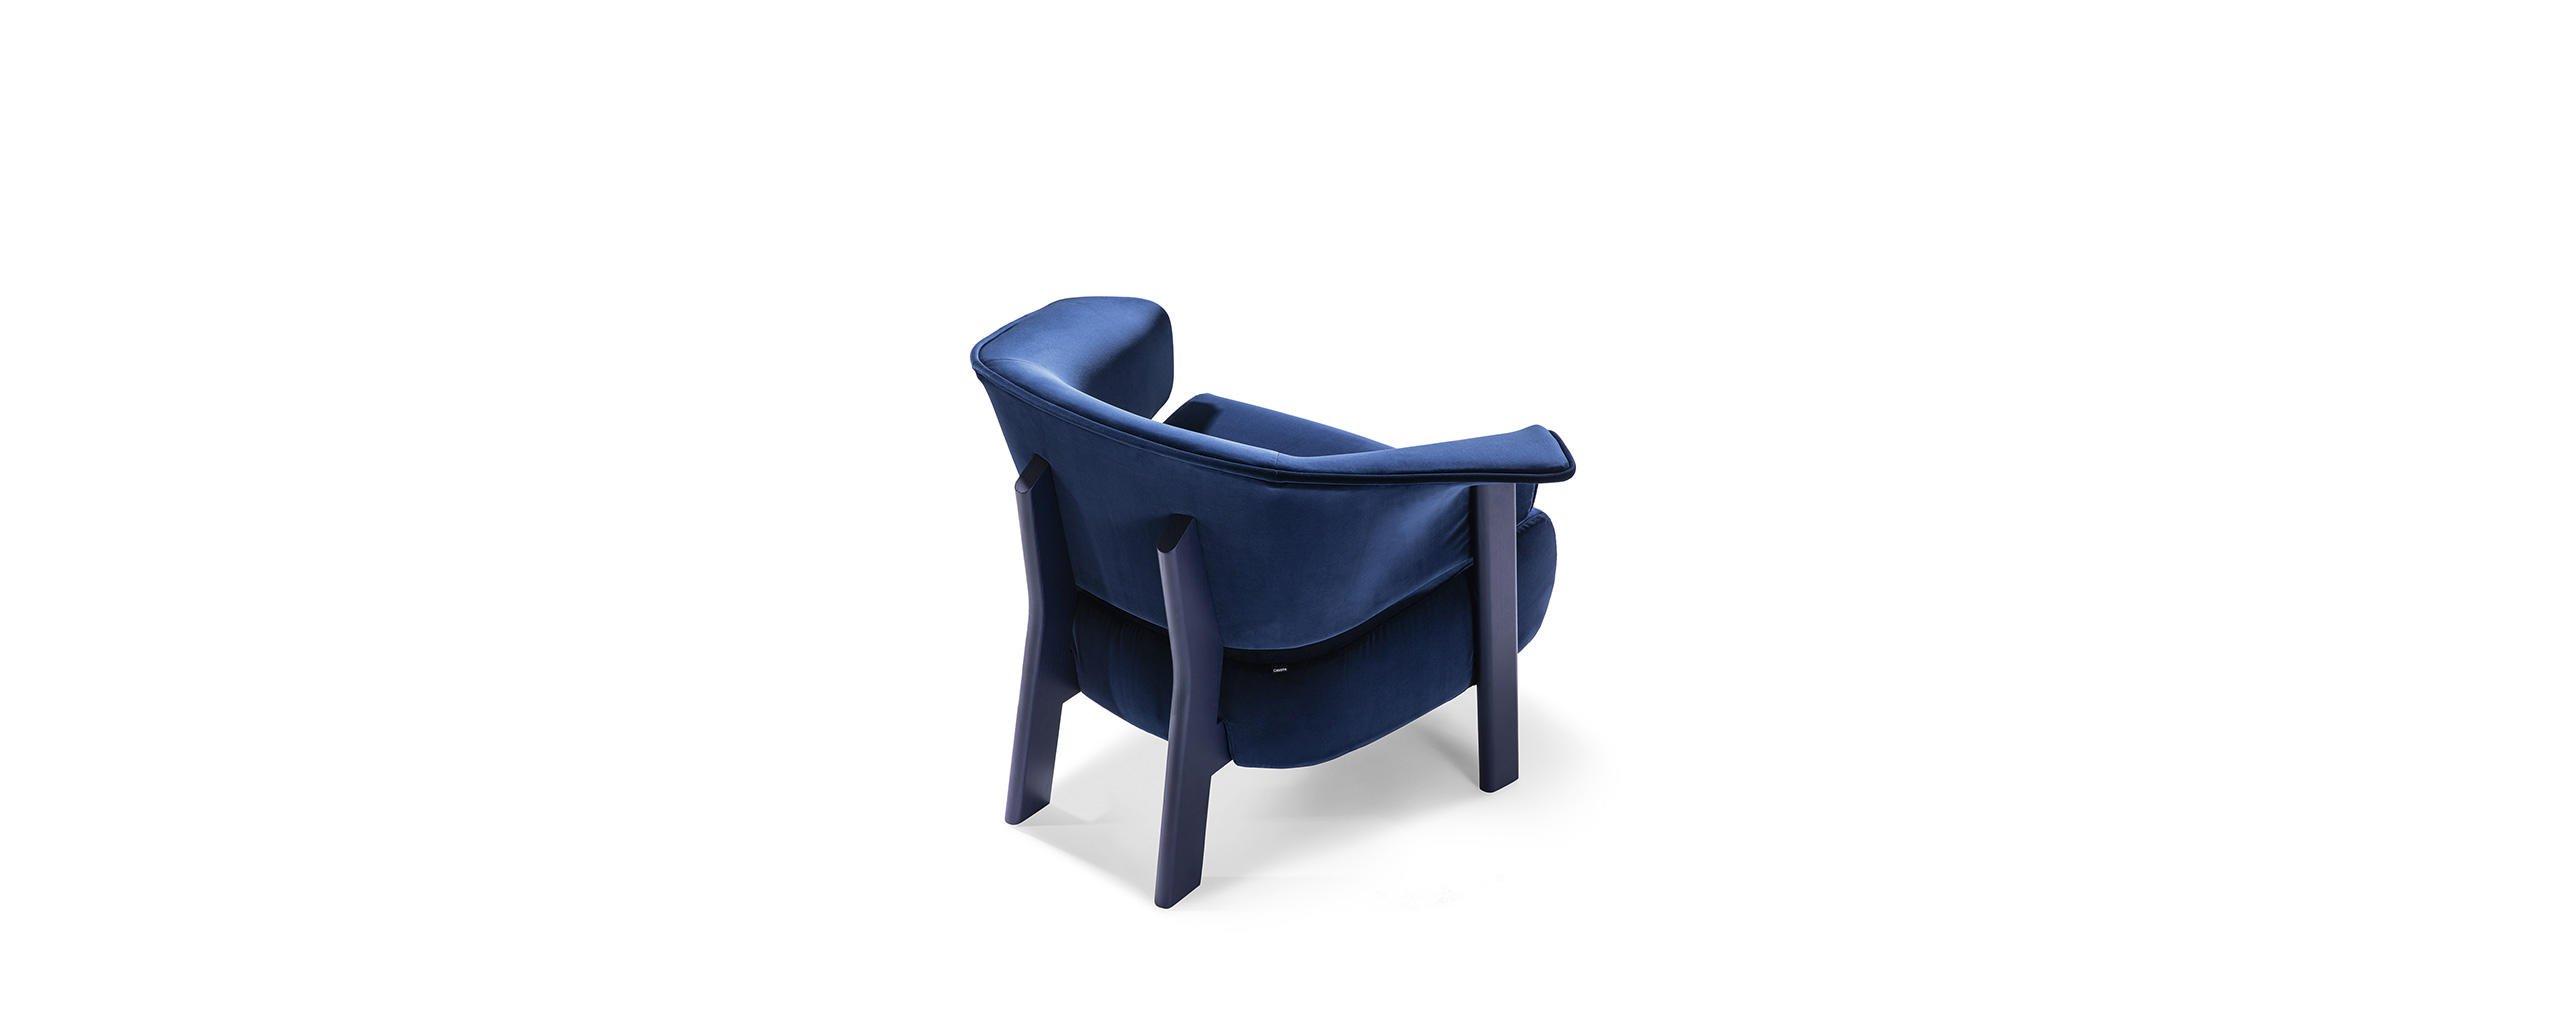 3_cassina_back-wing_armchair_patricia_urquiola_0